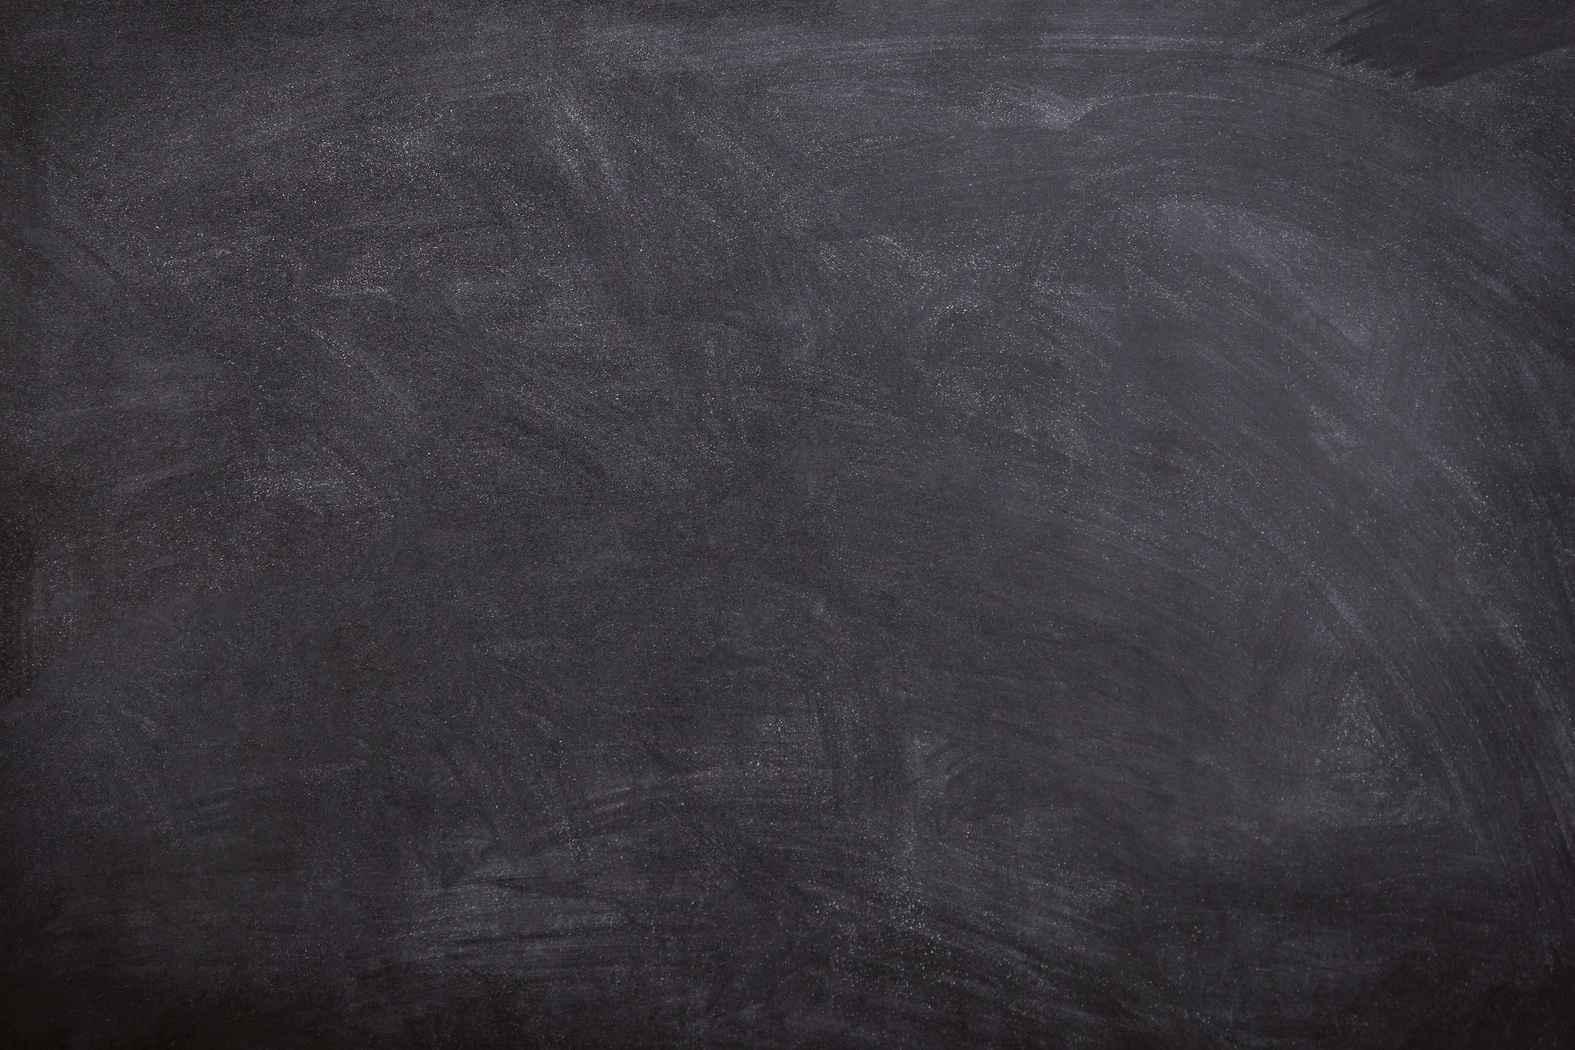 structure-board-texture-floor-blackboard-black-1057578-pxhere